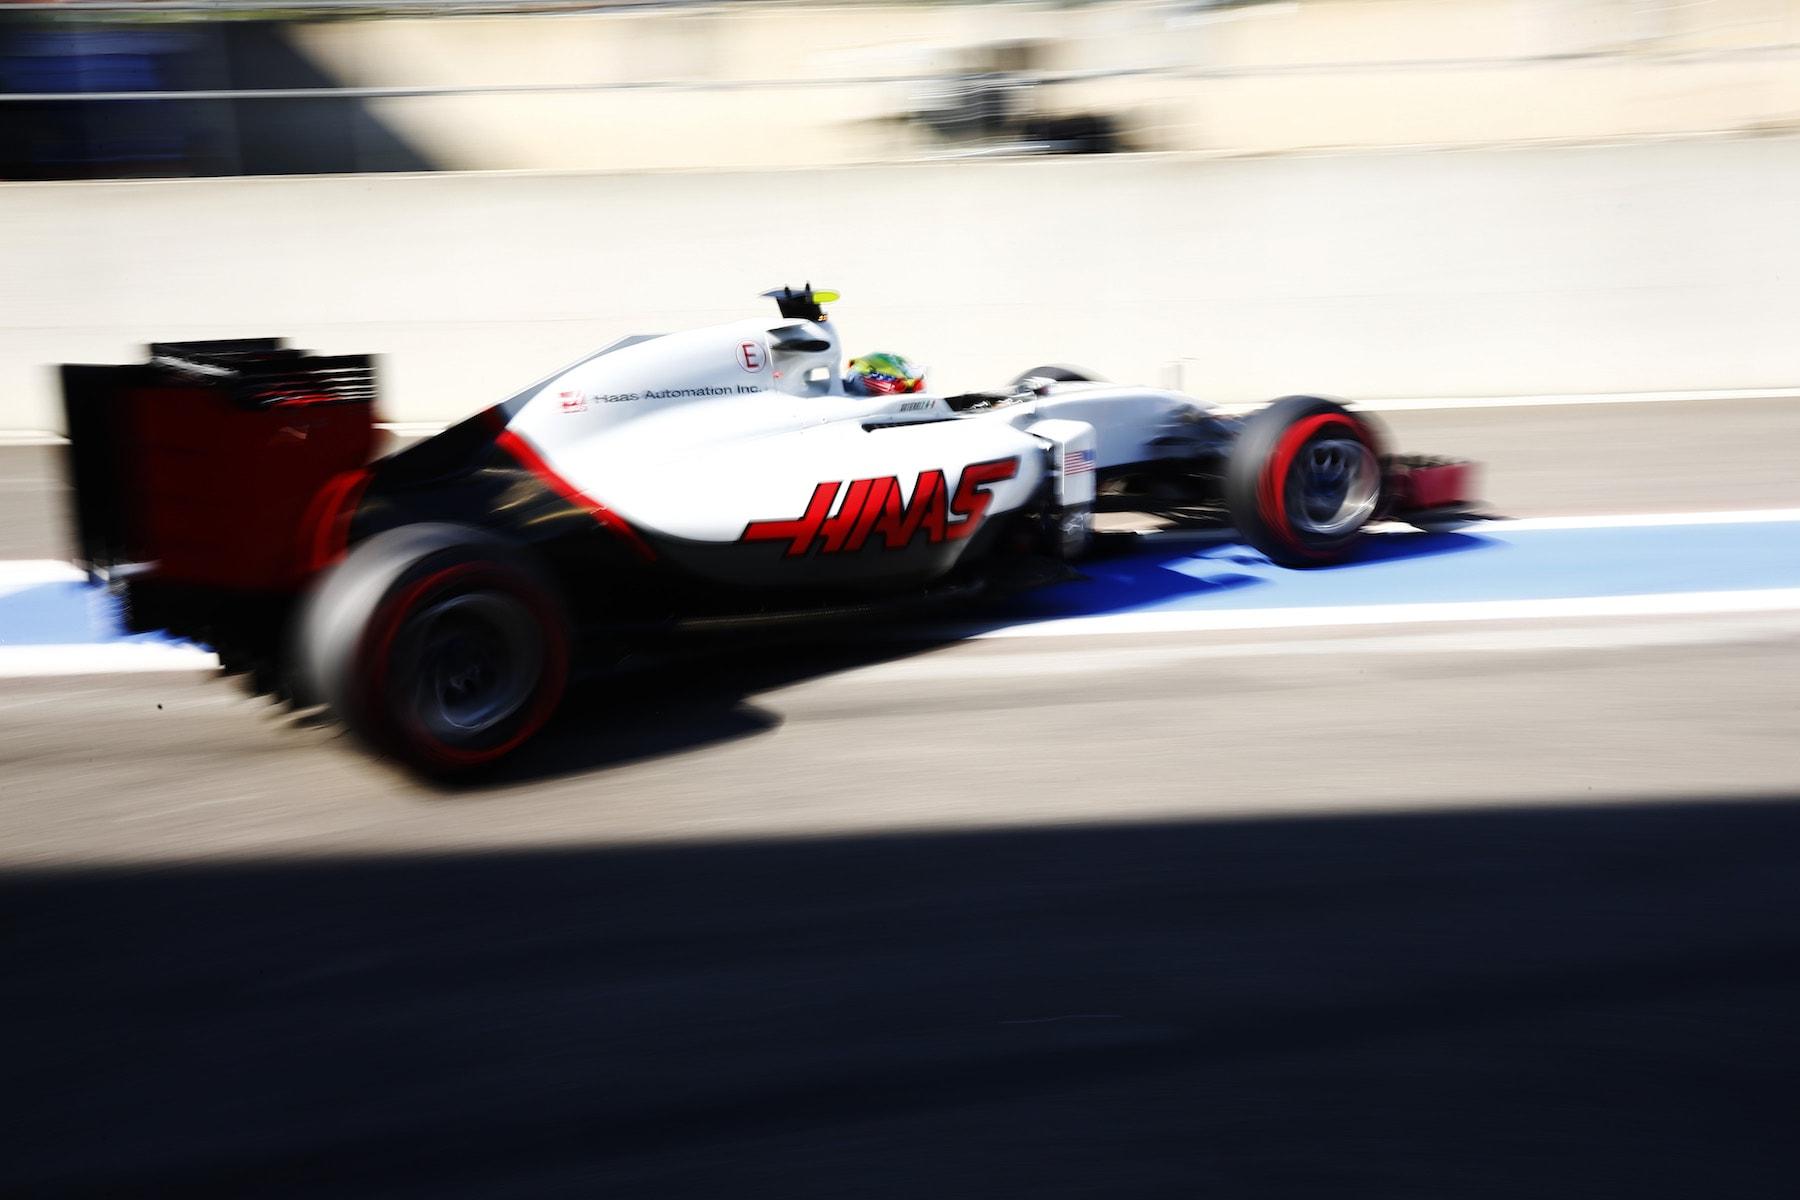 Salracing - Esteban Gutierrez | Haas F1 VF16